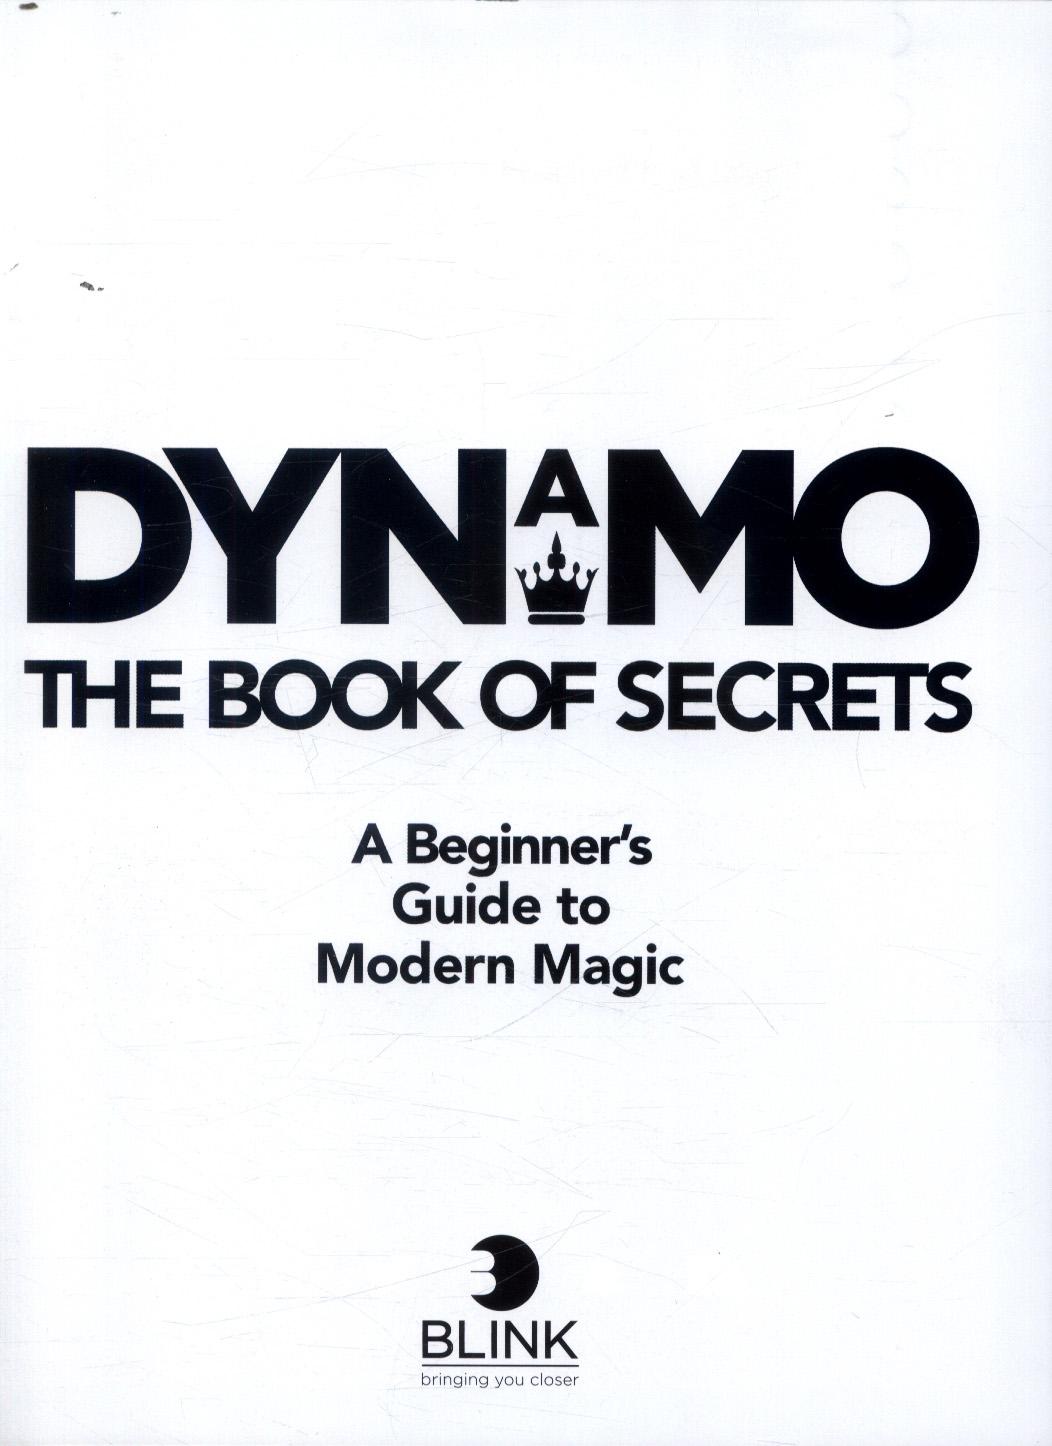 The book of secrets : a beginner's guide to modern magic